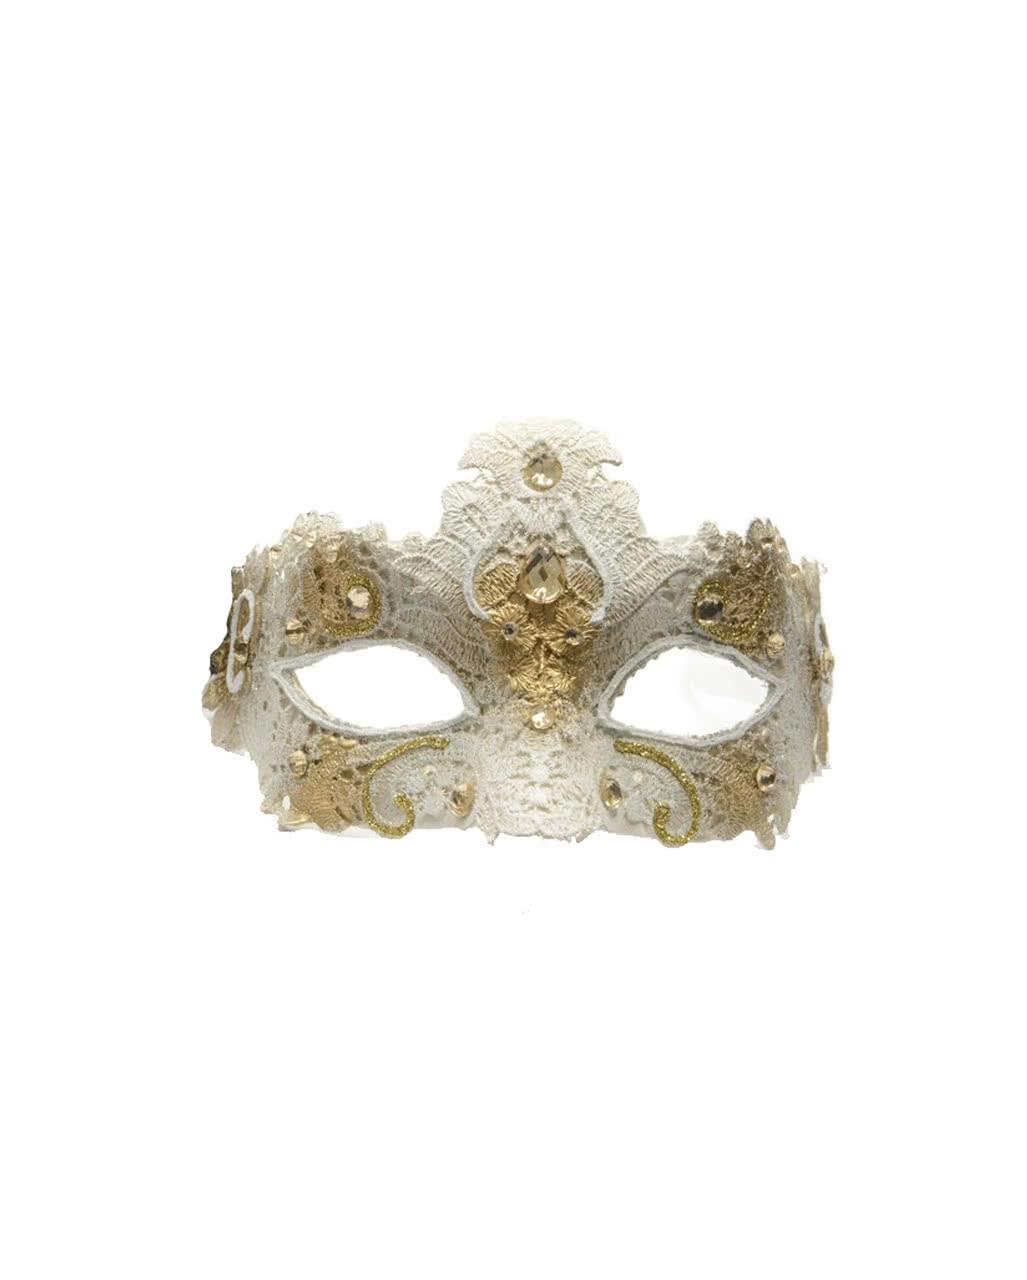 Venezianische Maske mit Spitze Beige/Gold ✩ | Horror-Shop.com